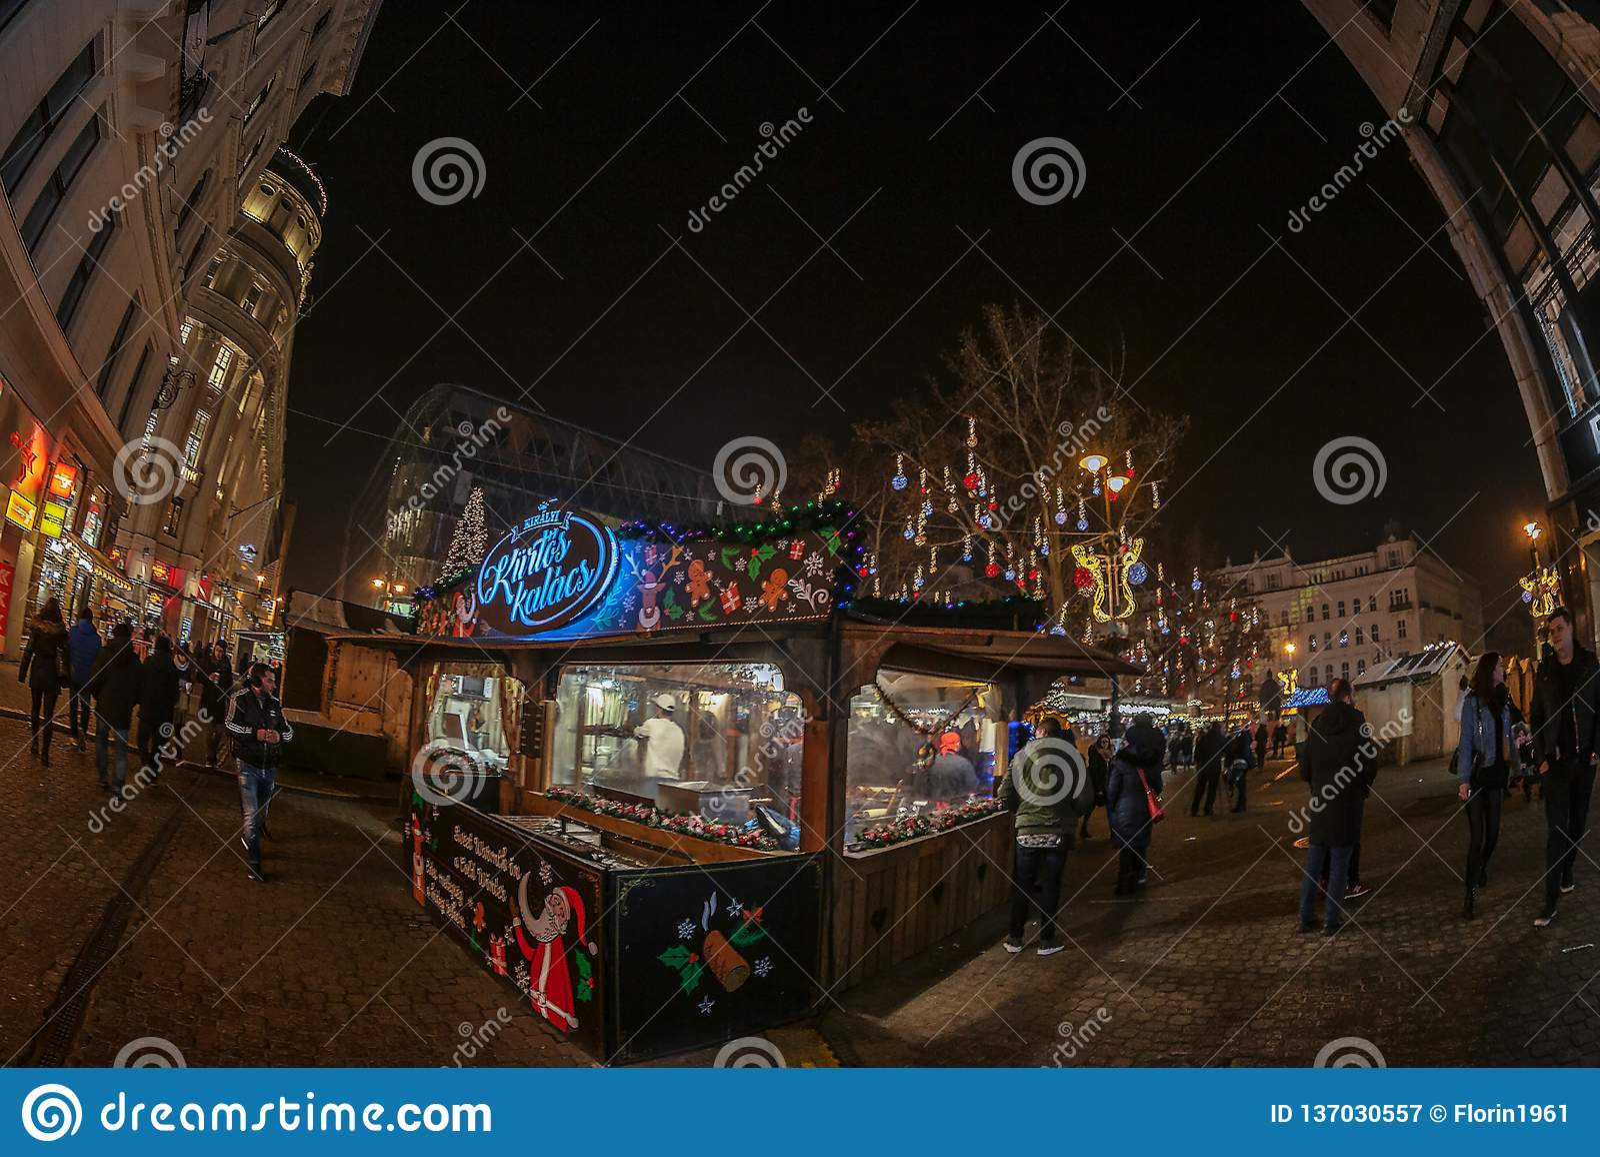 Budapest Christmas Market 2018.Christmas Market In Budapest Hungary Editorial Photography